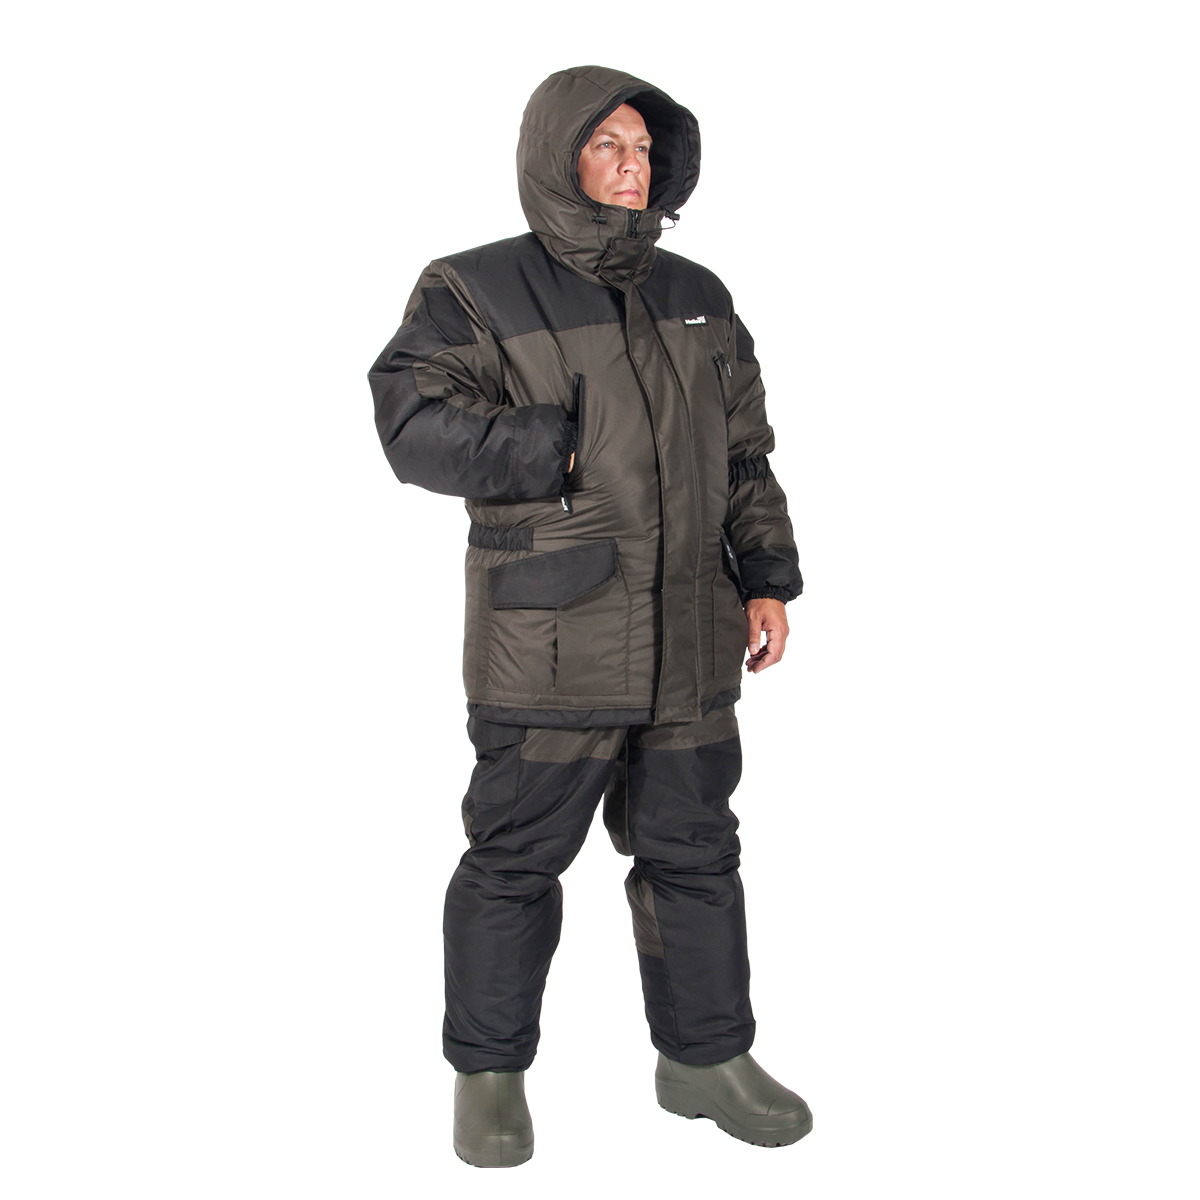 Костюм зимний Helios ГОРКА (полукомбинезон), Зимние брюки и полукомбинезоны - арт. 1127030348